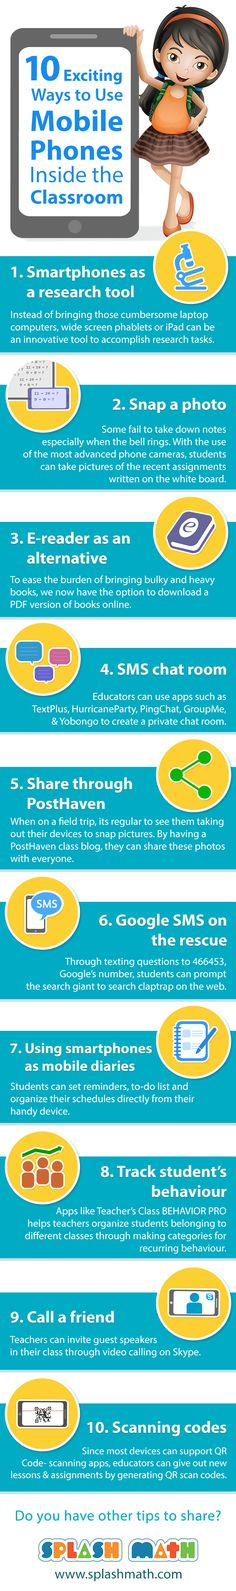 51 best Mobile Learning images on Pinterest | Mobile learning ...